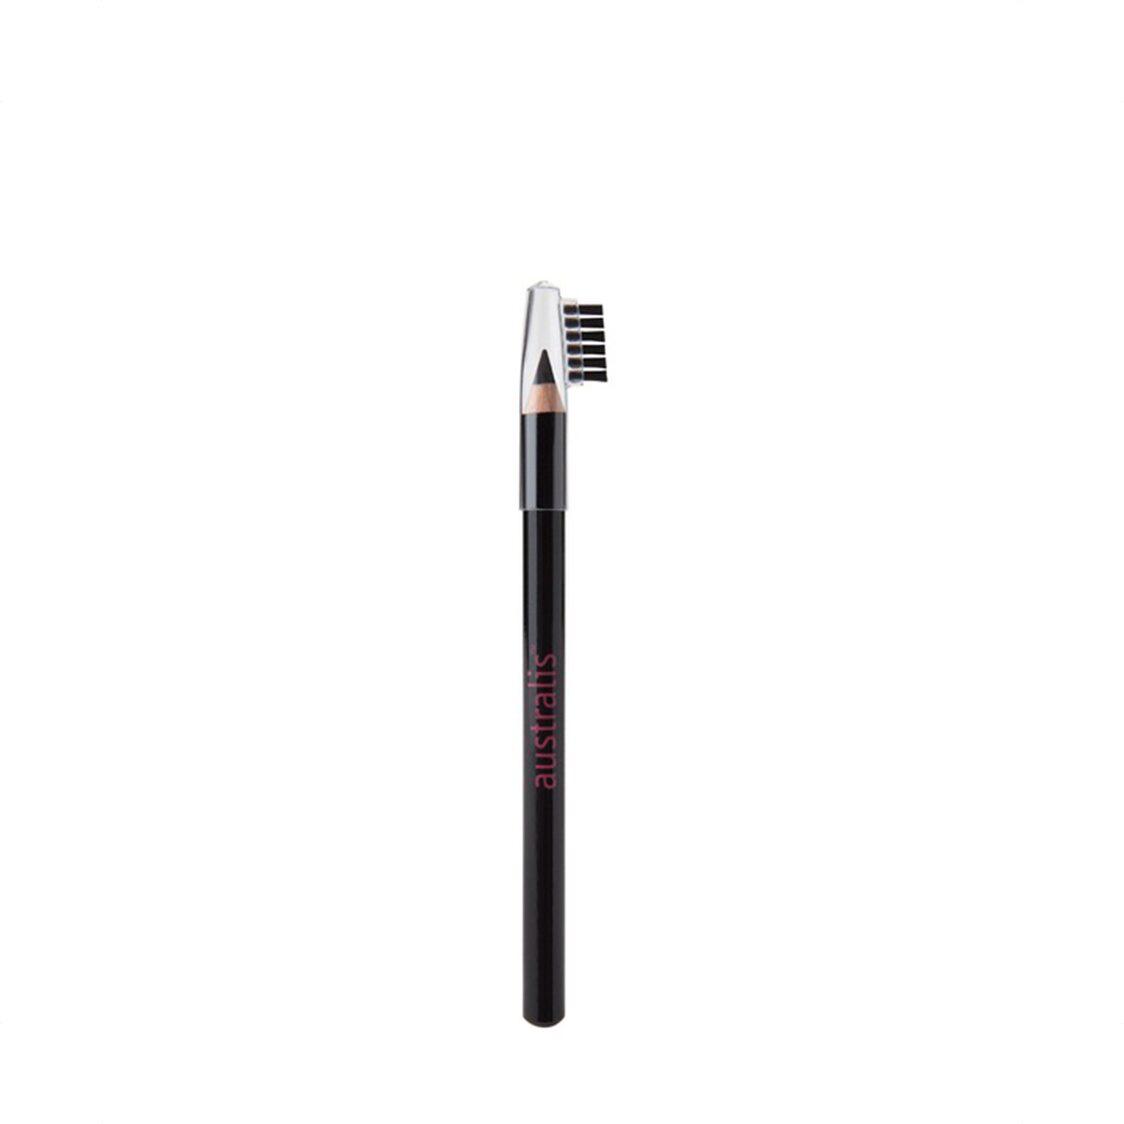 Australis Eyebrow Pencil - Black